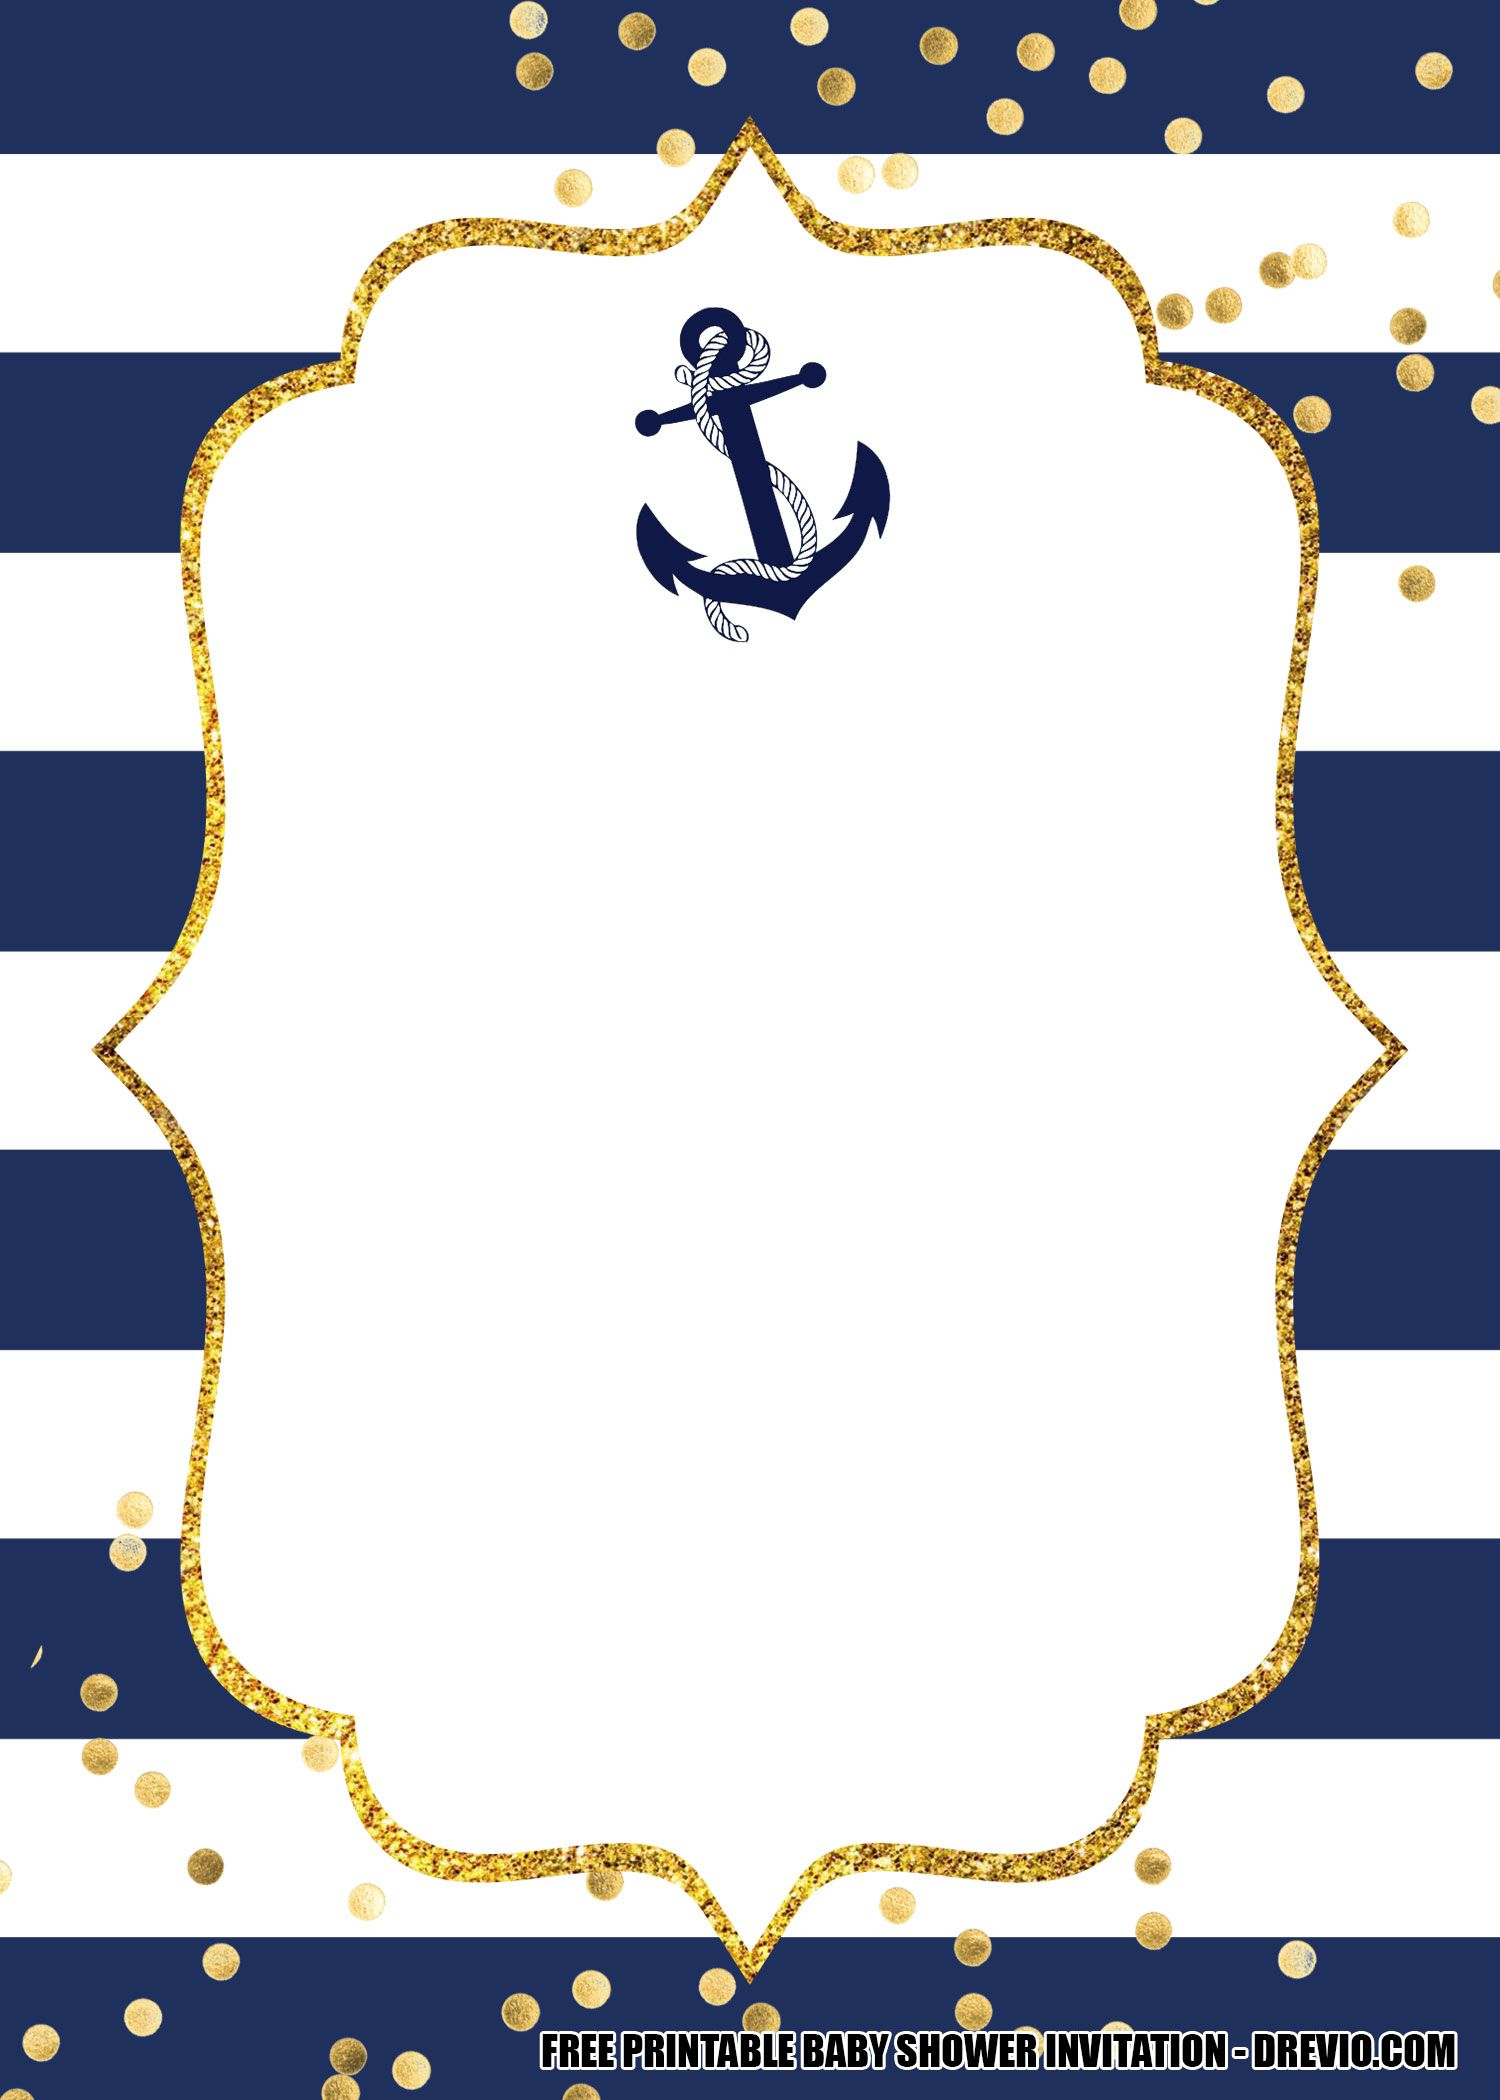 15 Free Nautical Birthday Invitation Templates Nautical Baby Shower Invitations Nautical Birthday Invitations Free Printable Baby Shower Invitations